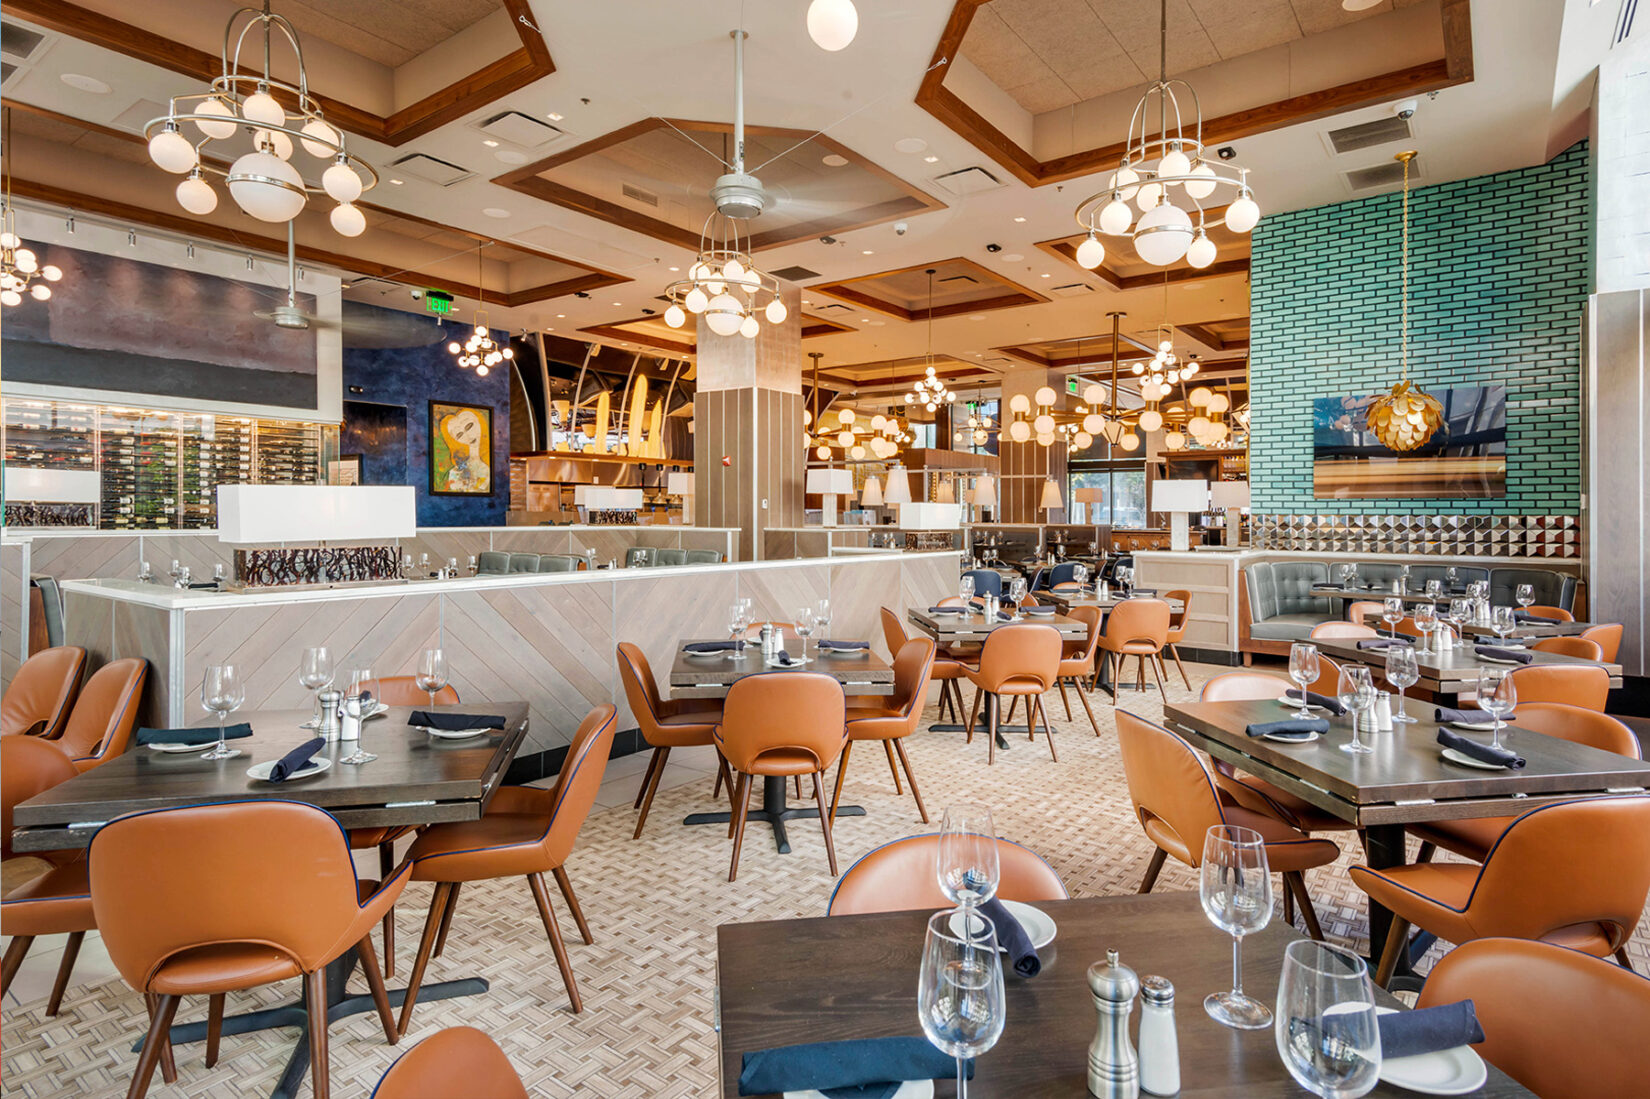 Upscale Restaurant - Aqua